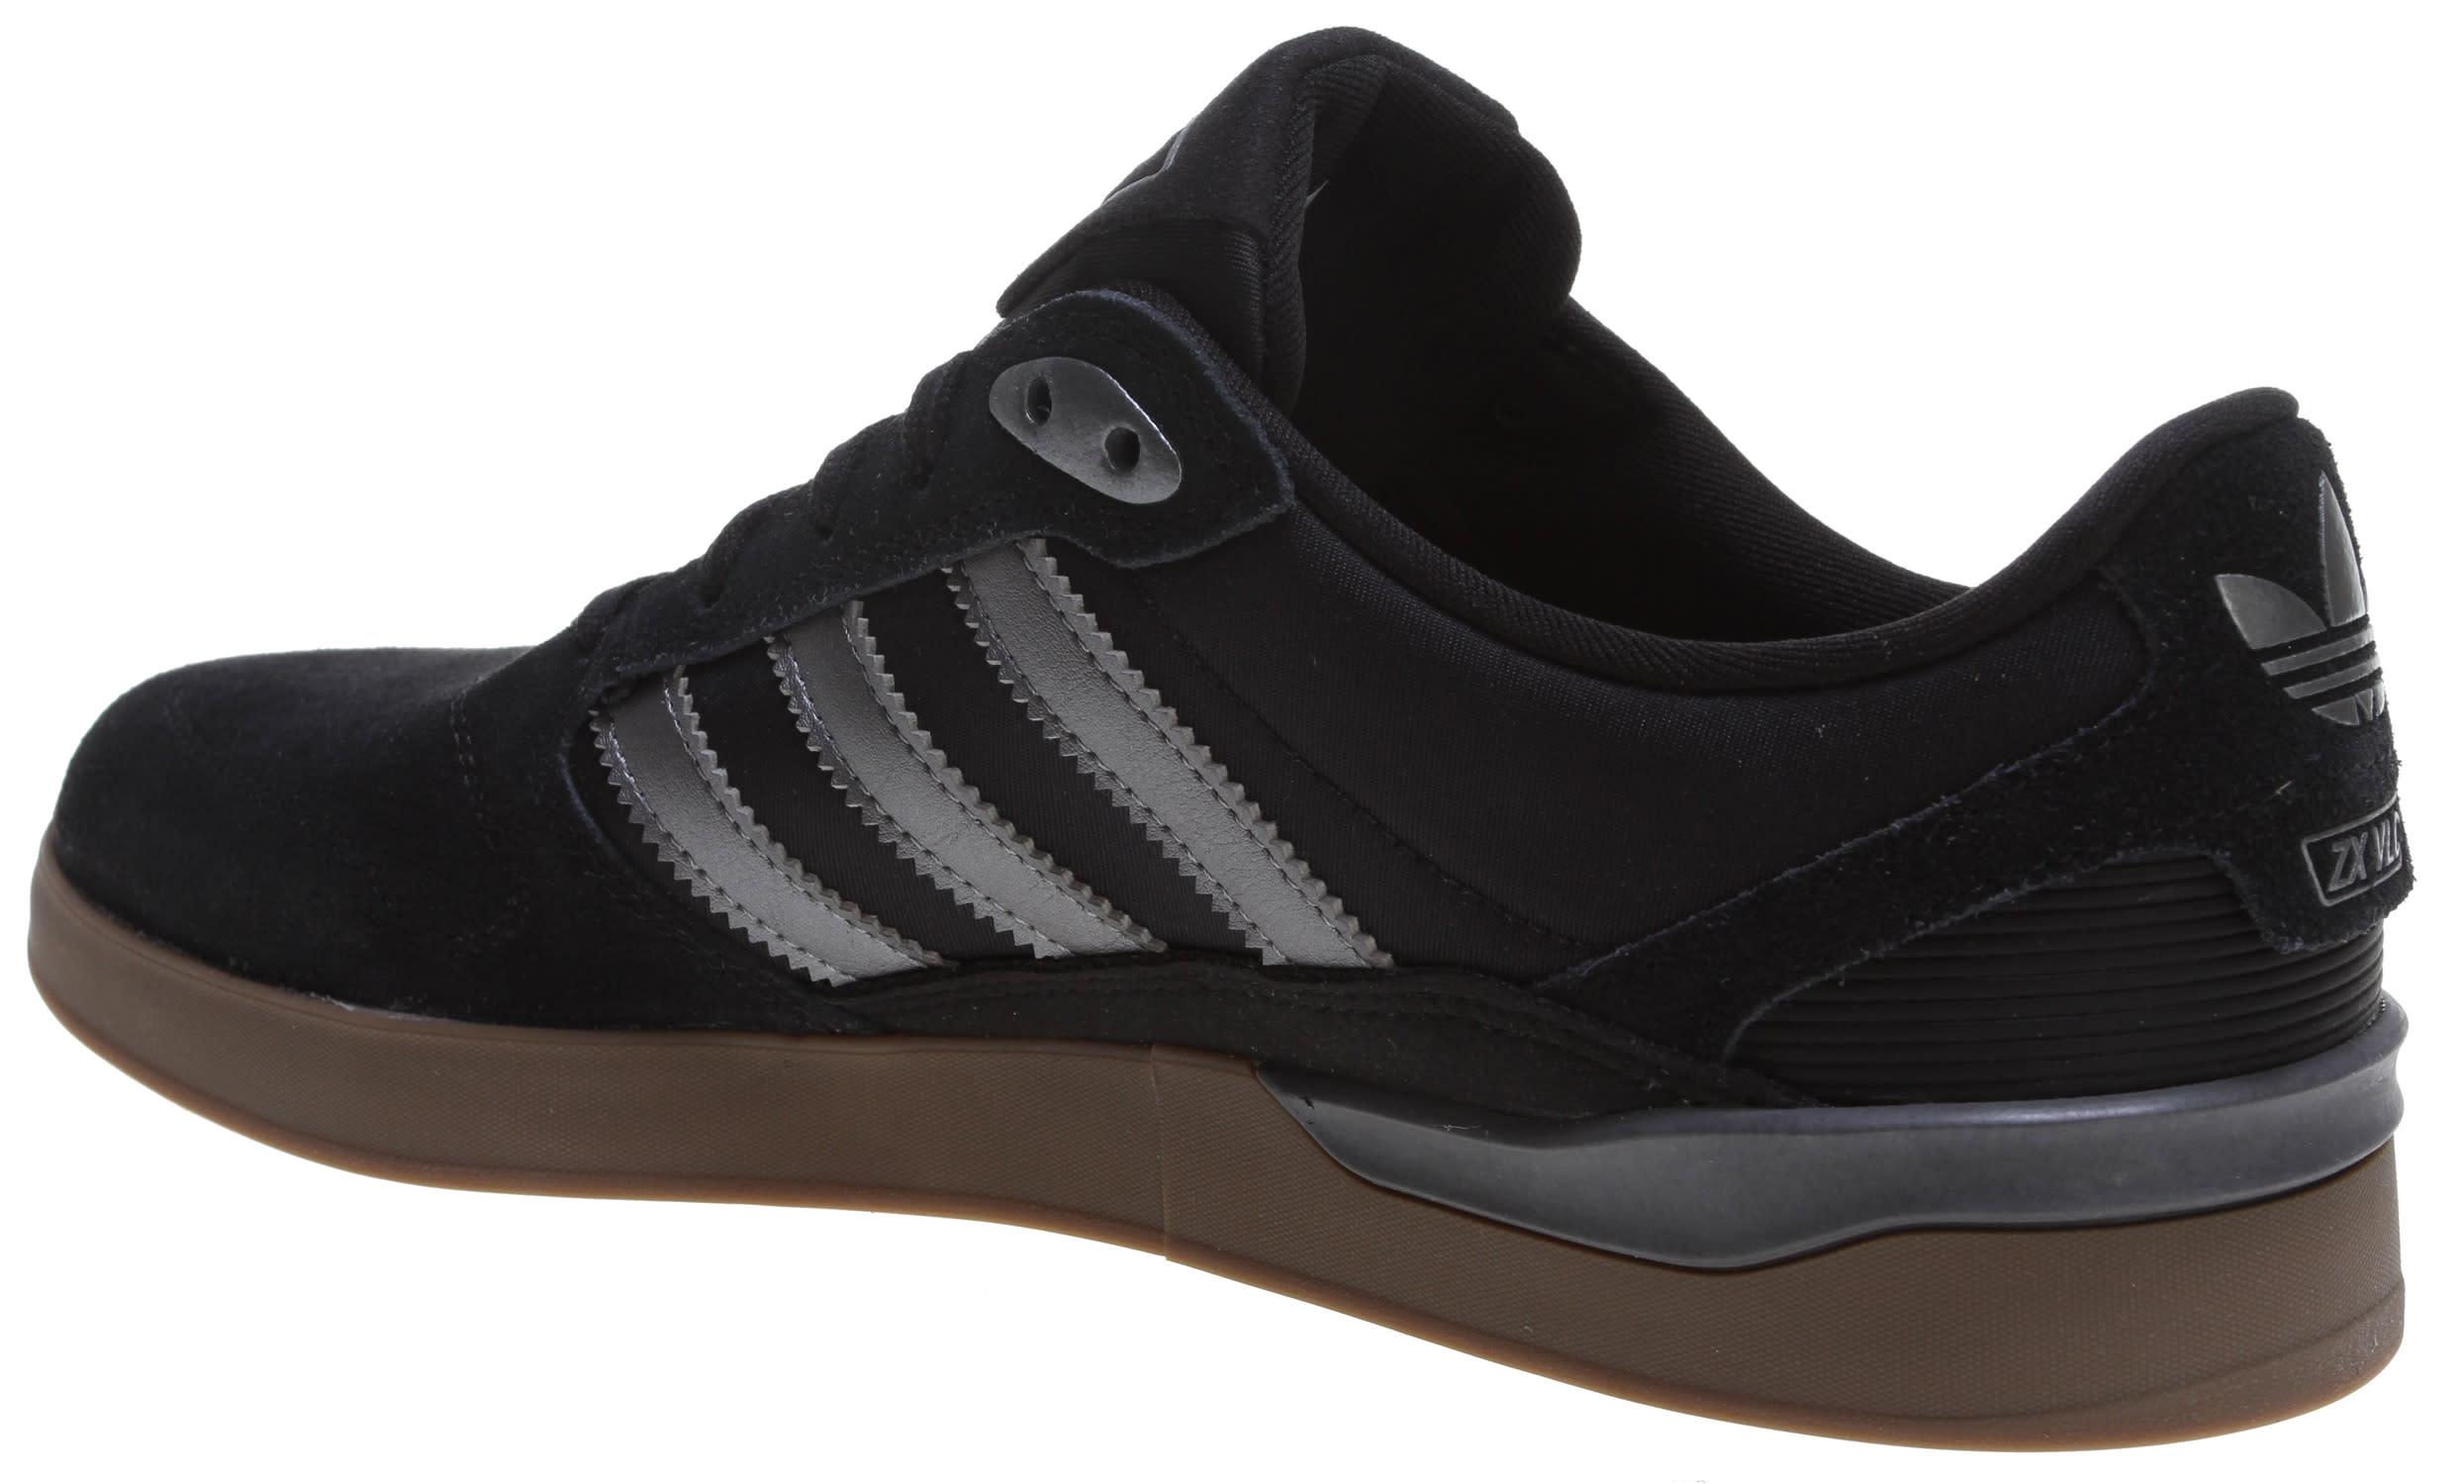 81f9c033c Adidas Zx Vulc Black softwaretutor.co.uk